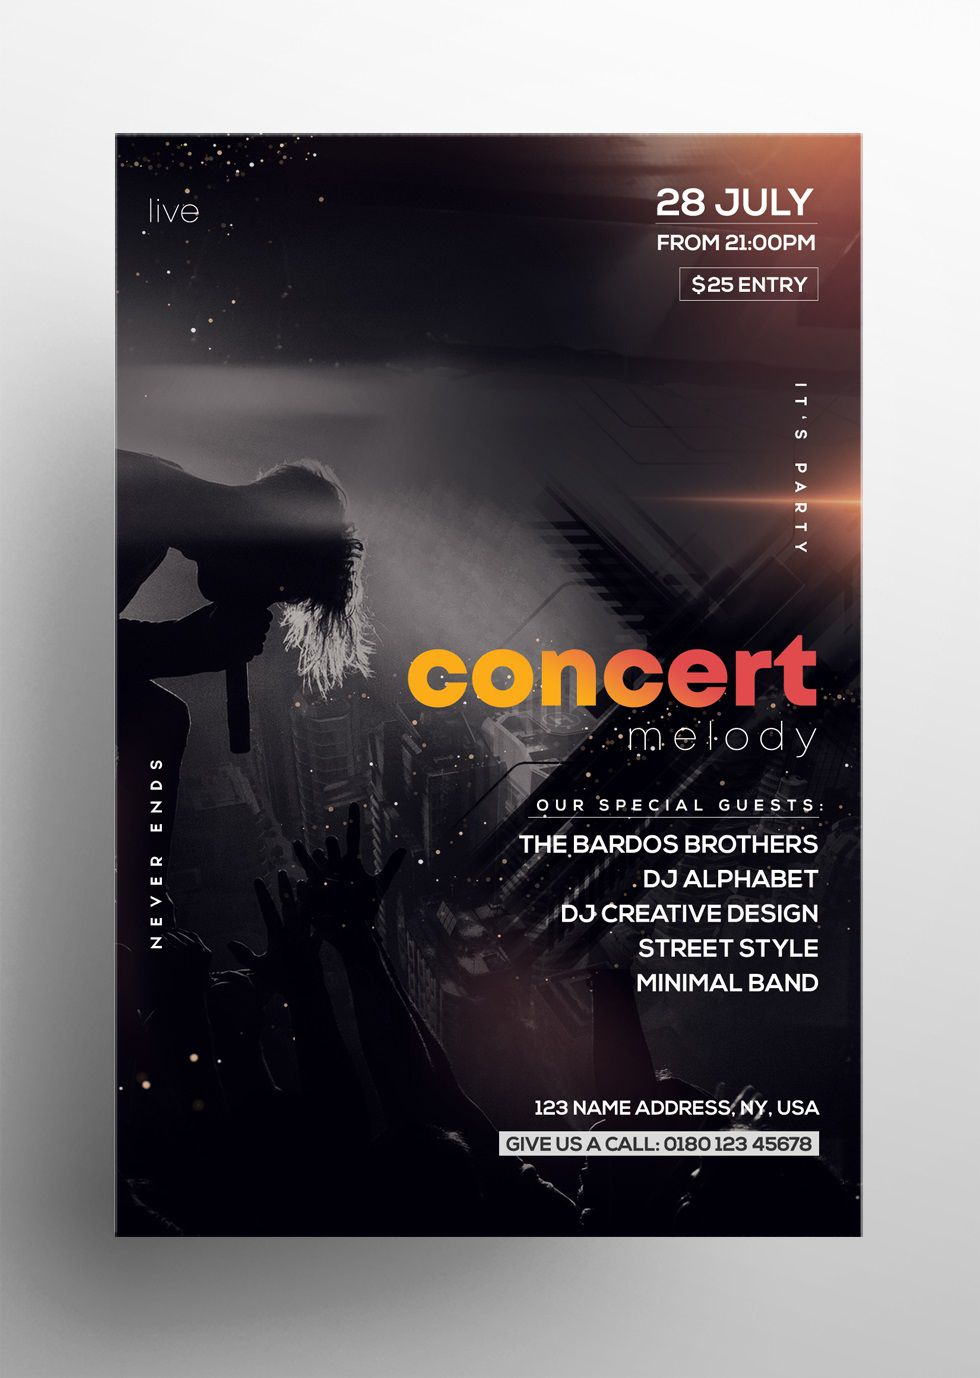 004 Surprising Free Concert Poster Template Sample  Word Classical MusicFull